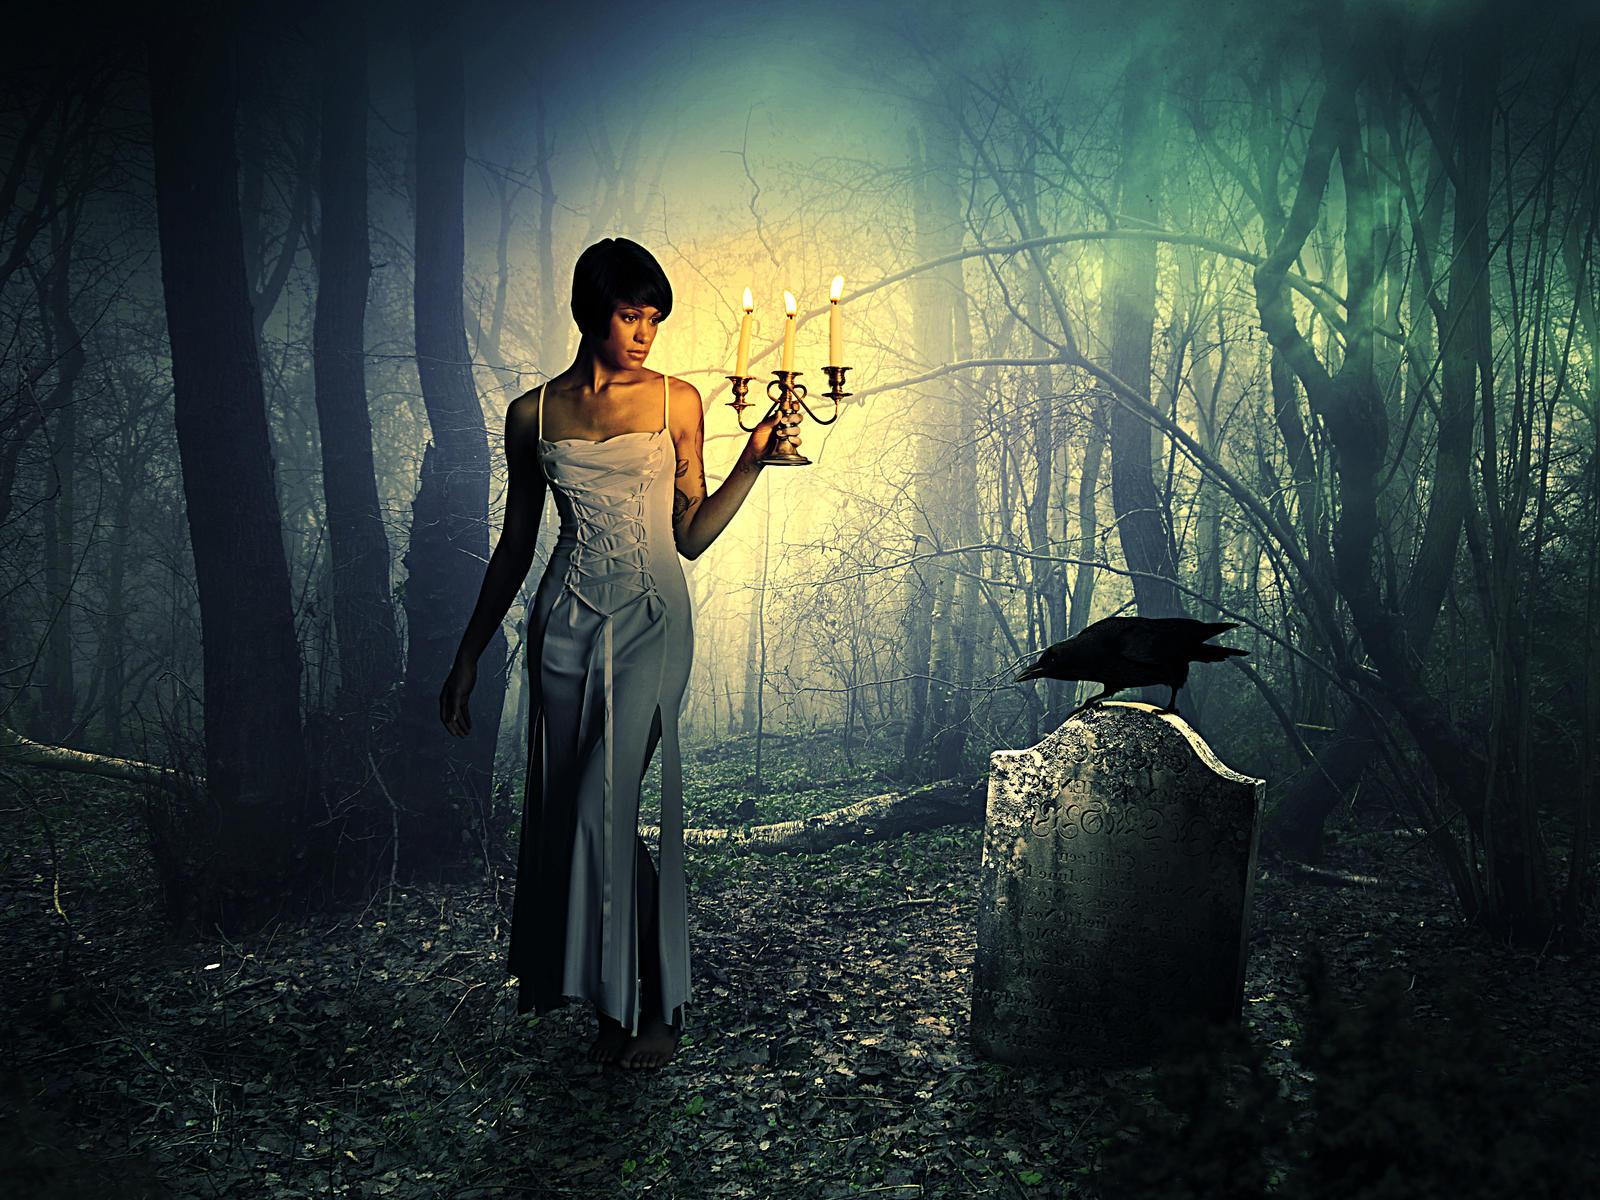 Dark Forest by ObnoxiousNox